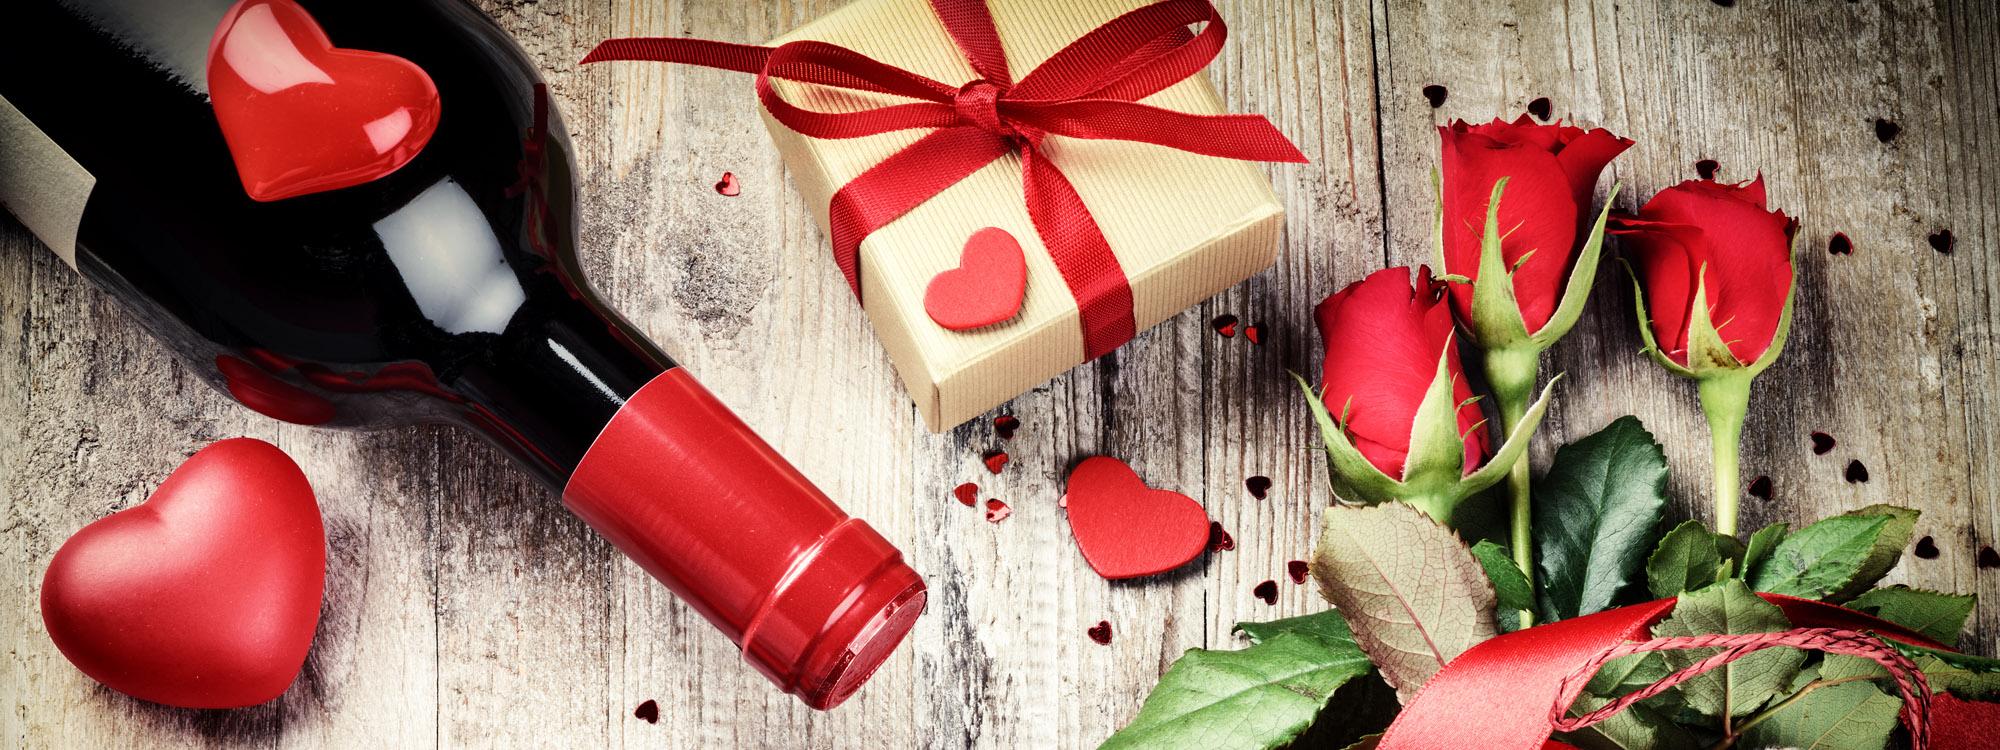 westside bench tasting experience valentines package